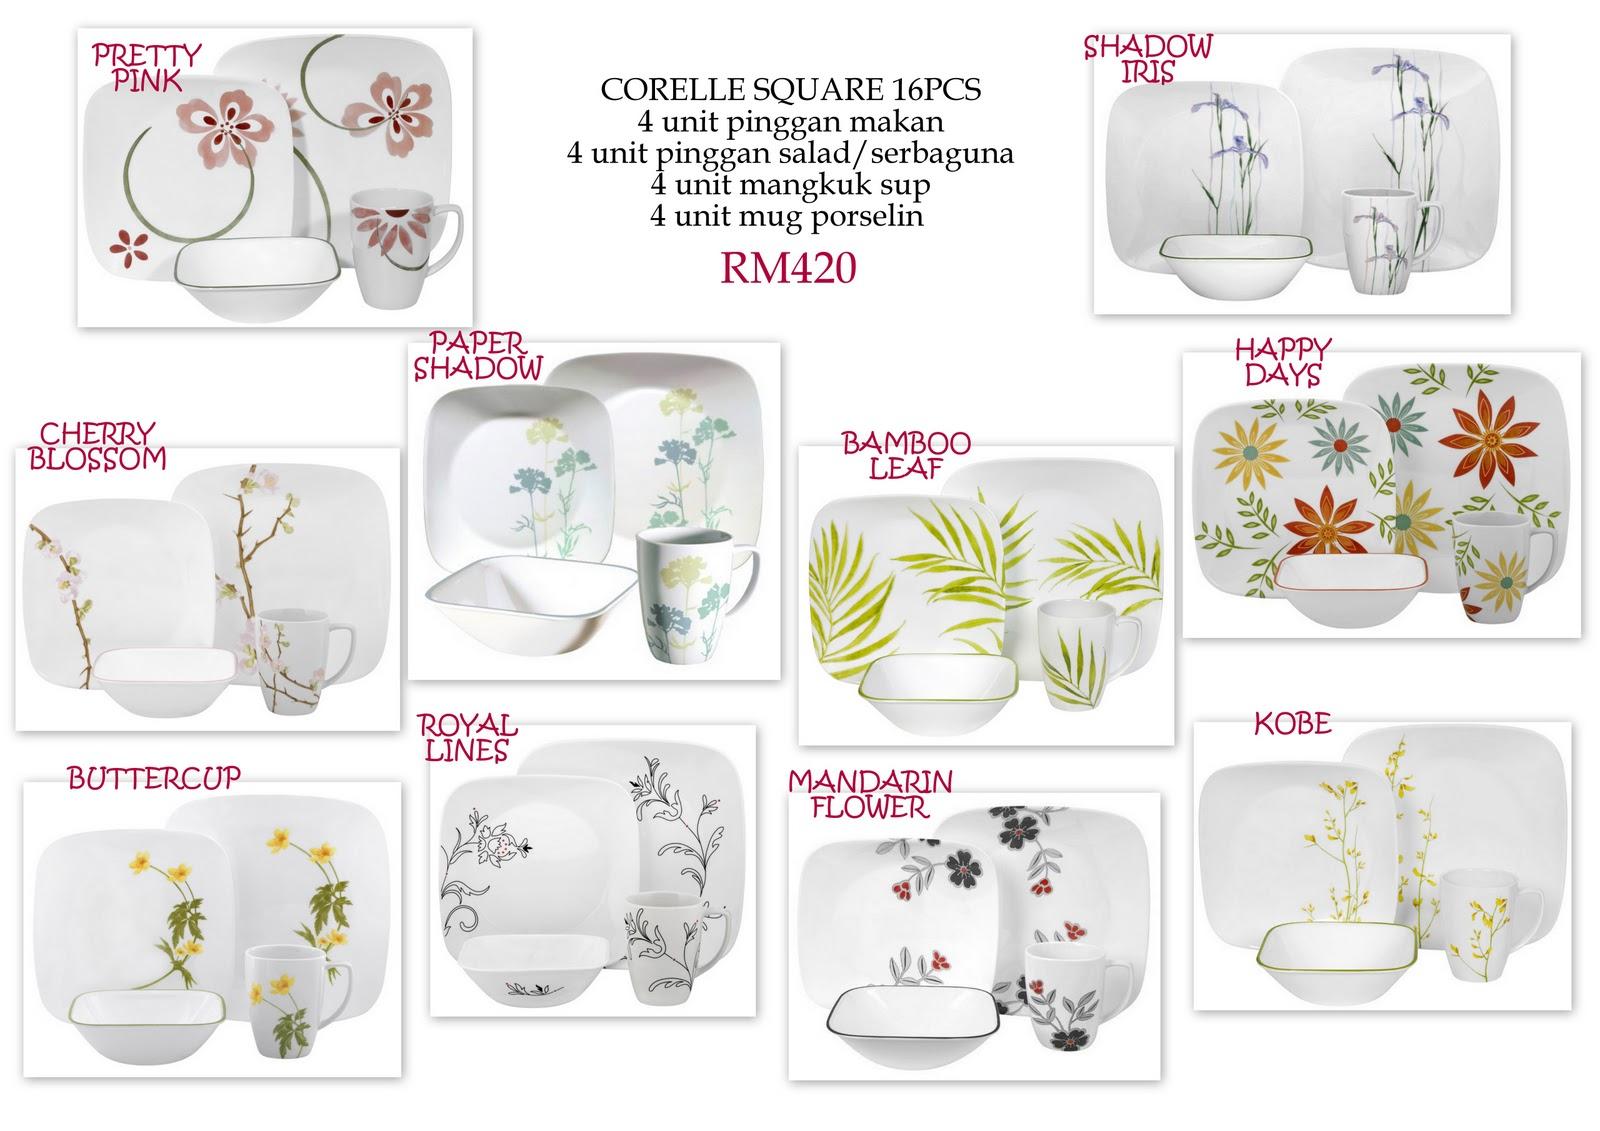 Corelle corningware store / Spirit halloween calgary locations